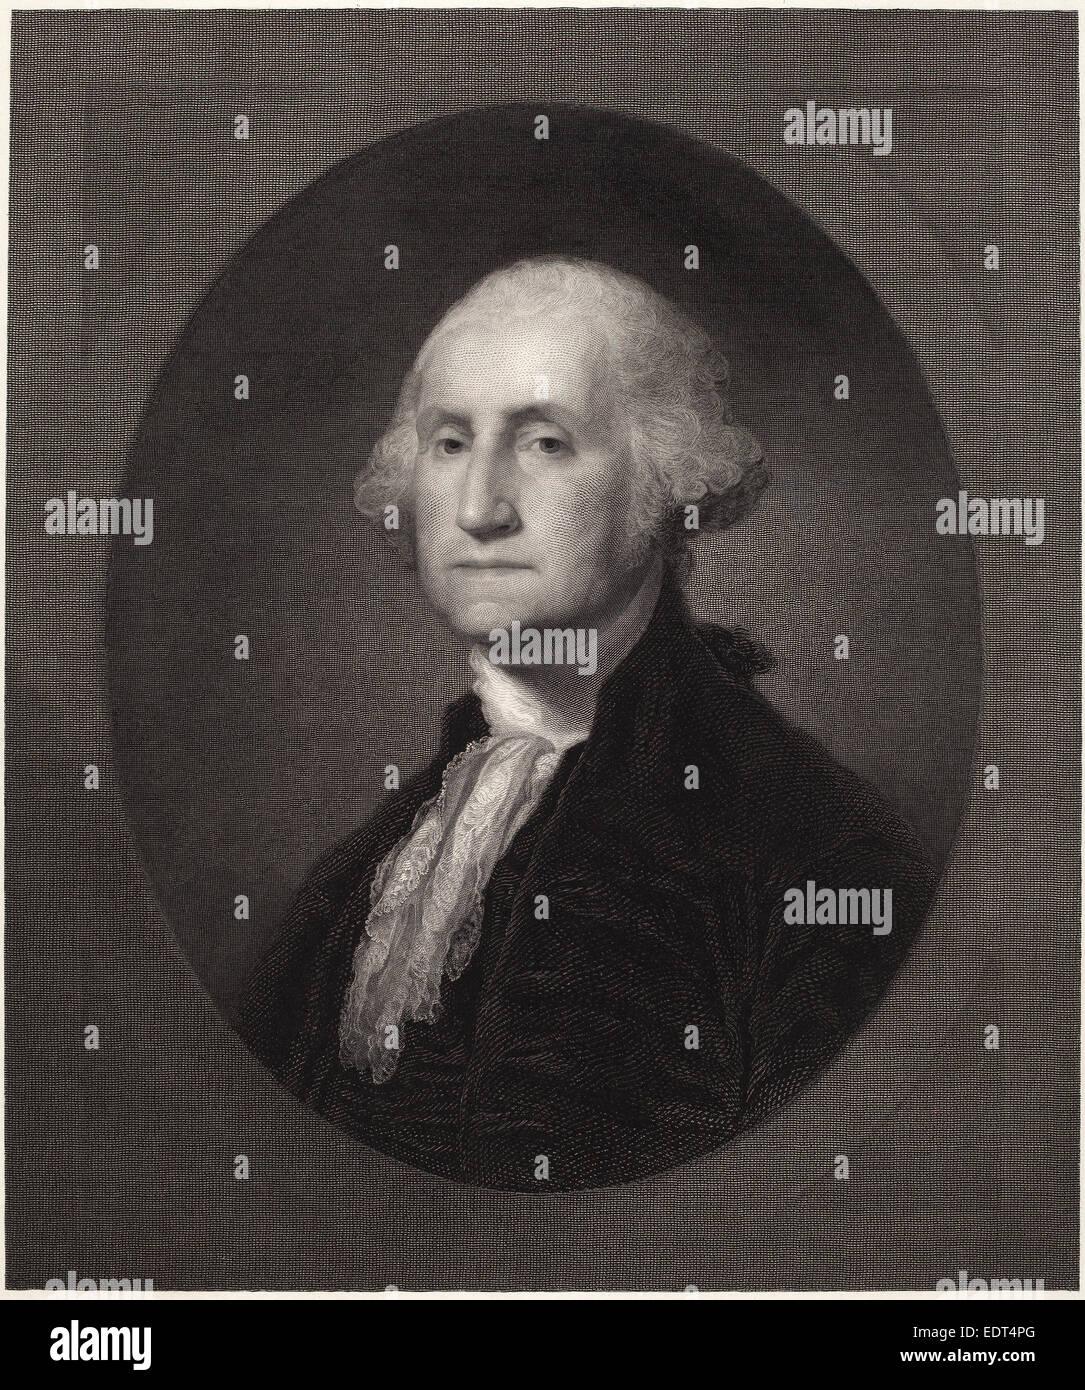 William Edgar Marshall, George Washington, American, 1837 - 1906, c. 1862, engraving on paperboard - Stock Image